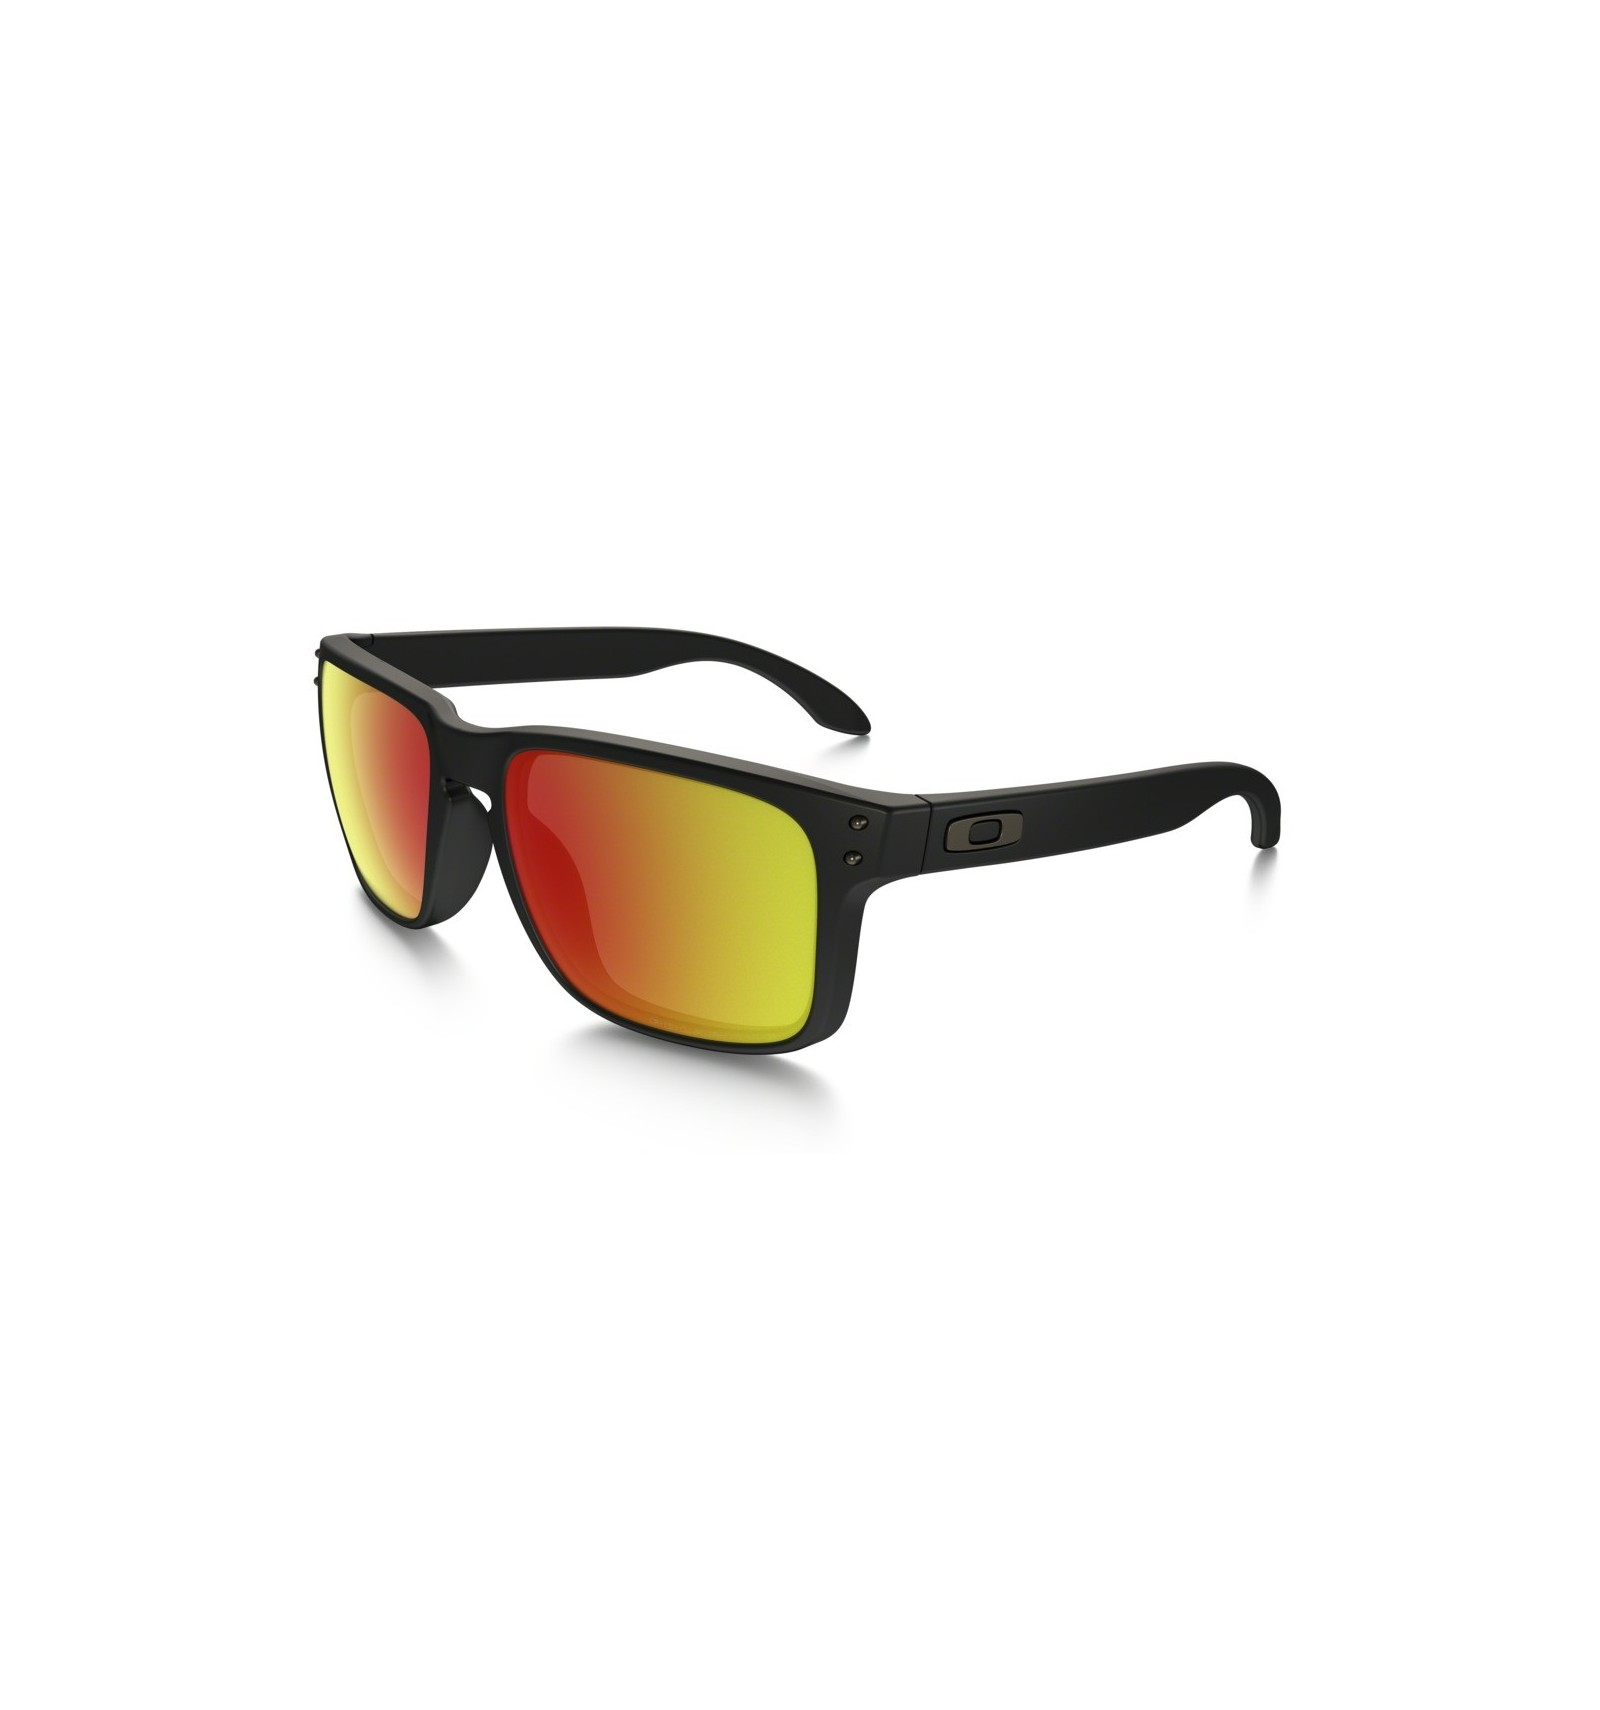 f05d399202 Gafas de sol OAKLEY 9102 HOLBROOK Matte Black /Ruby Iridium POLARIZADAS